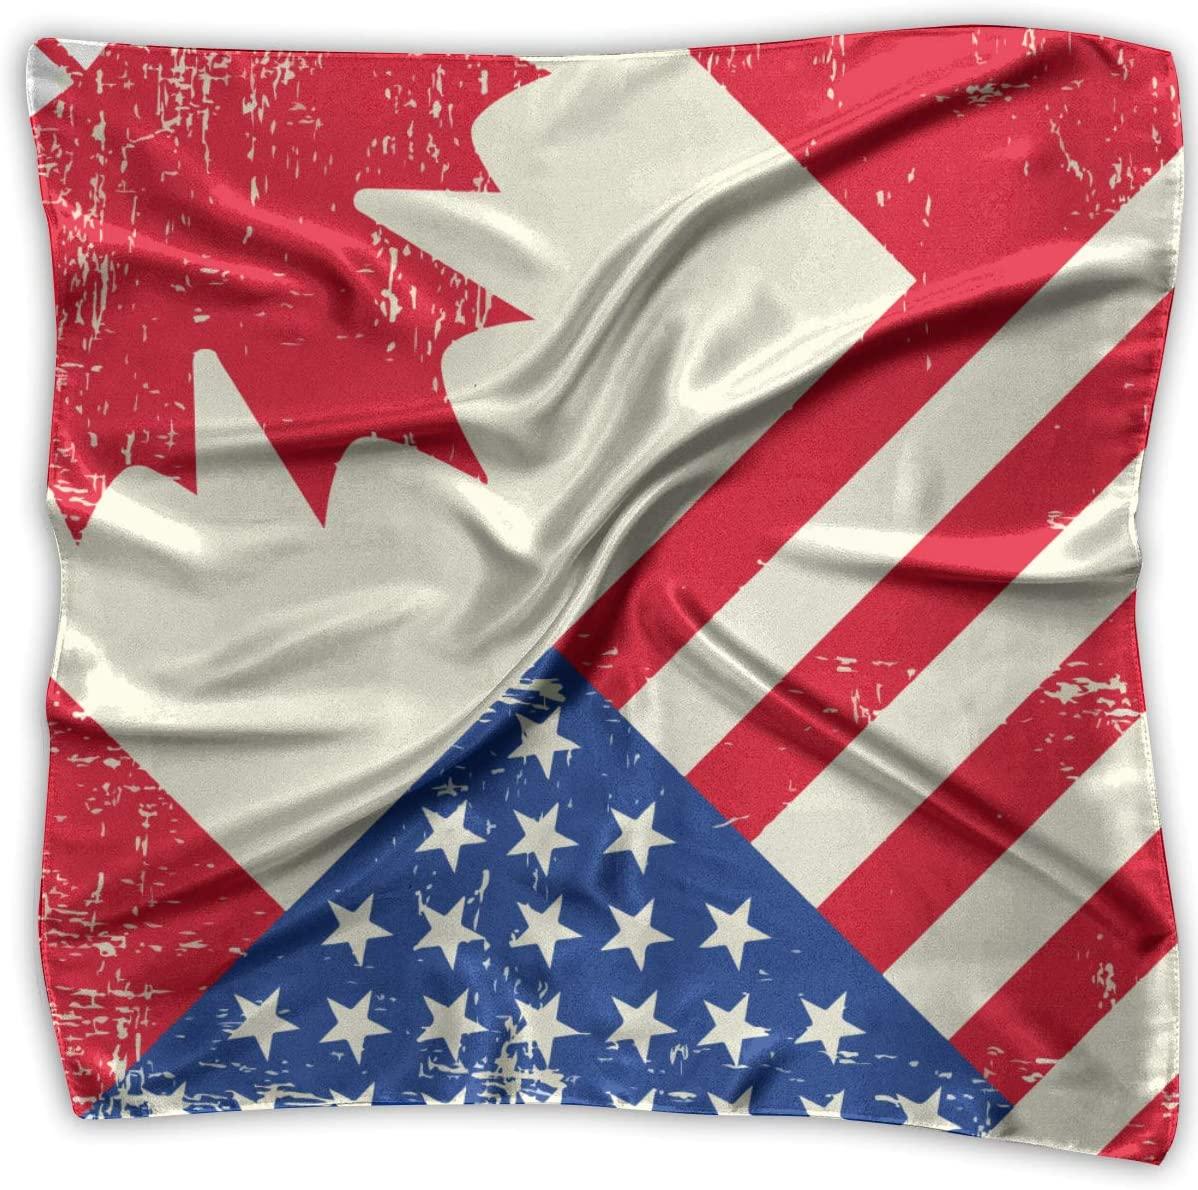 WFIRE Canadian Canada American USA Flag Square Handkerchiefs Scarf Shawl Bandanas Headscarf Neckerchief